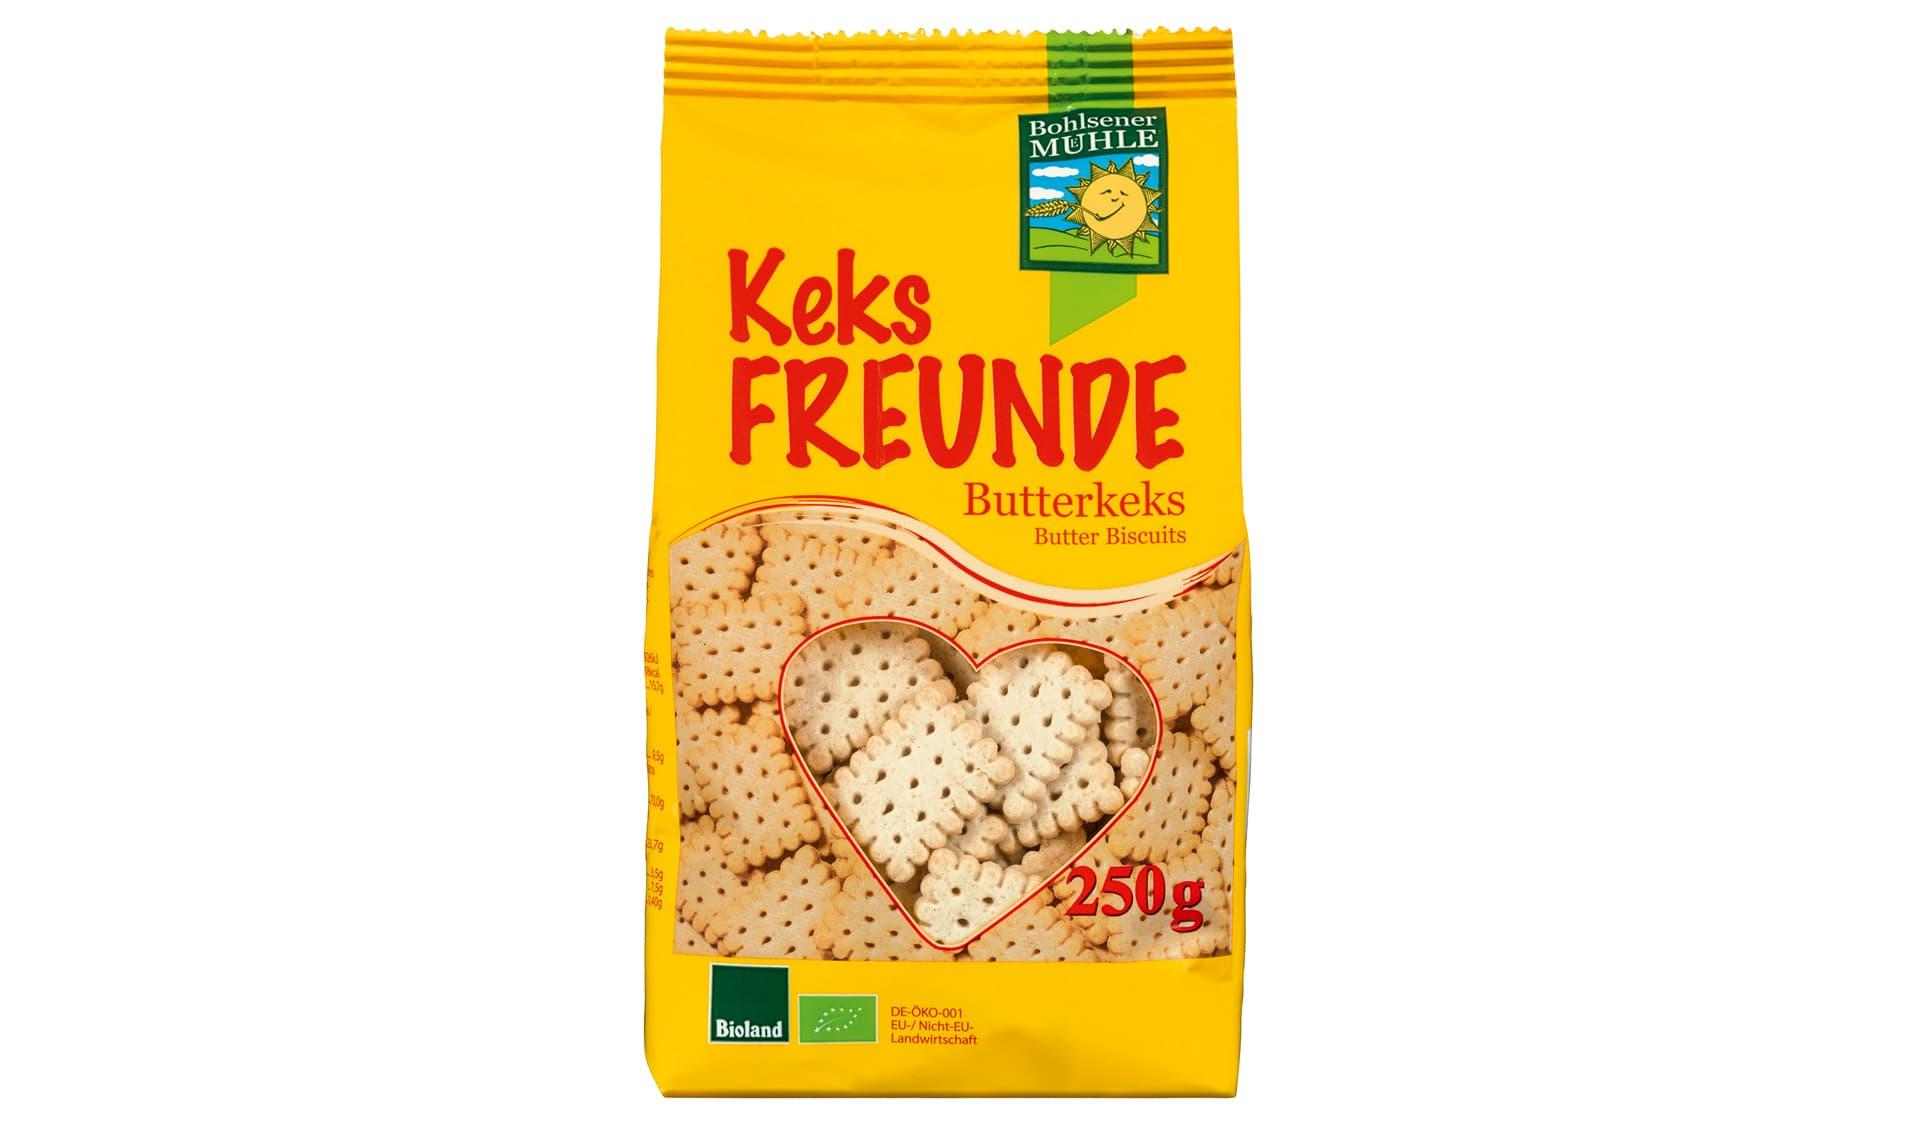 Bohlsener Mühle Keks Freunde Butterkeks (www.bohlsener-muehle.de)